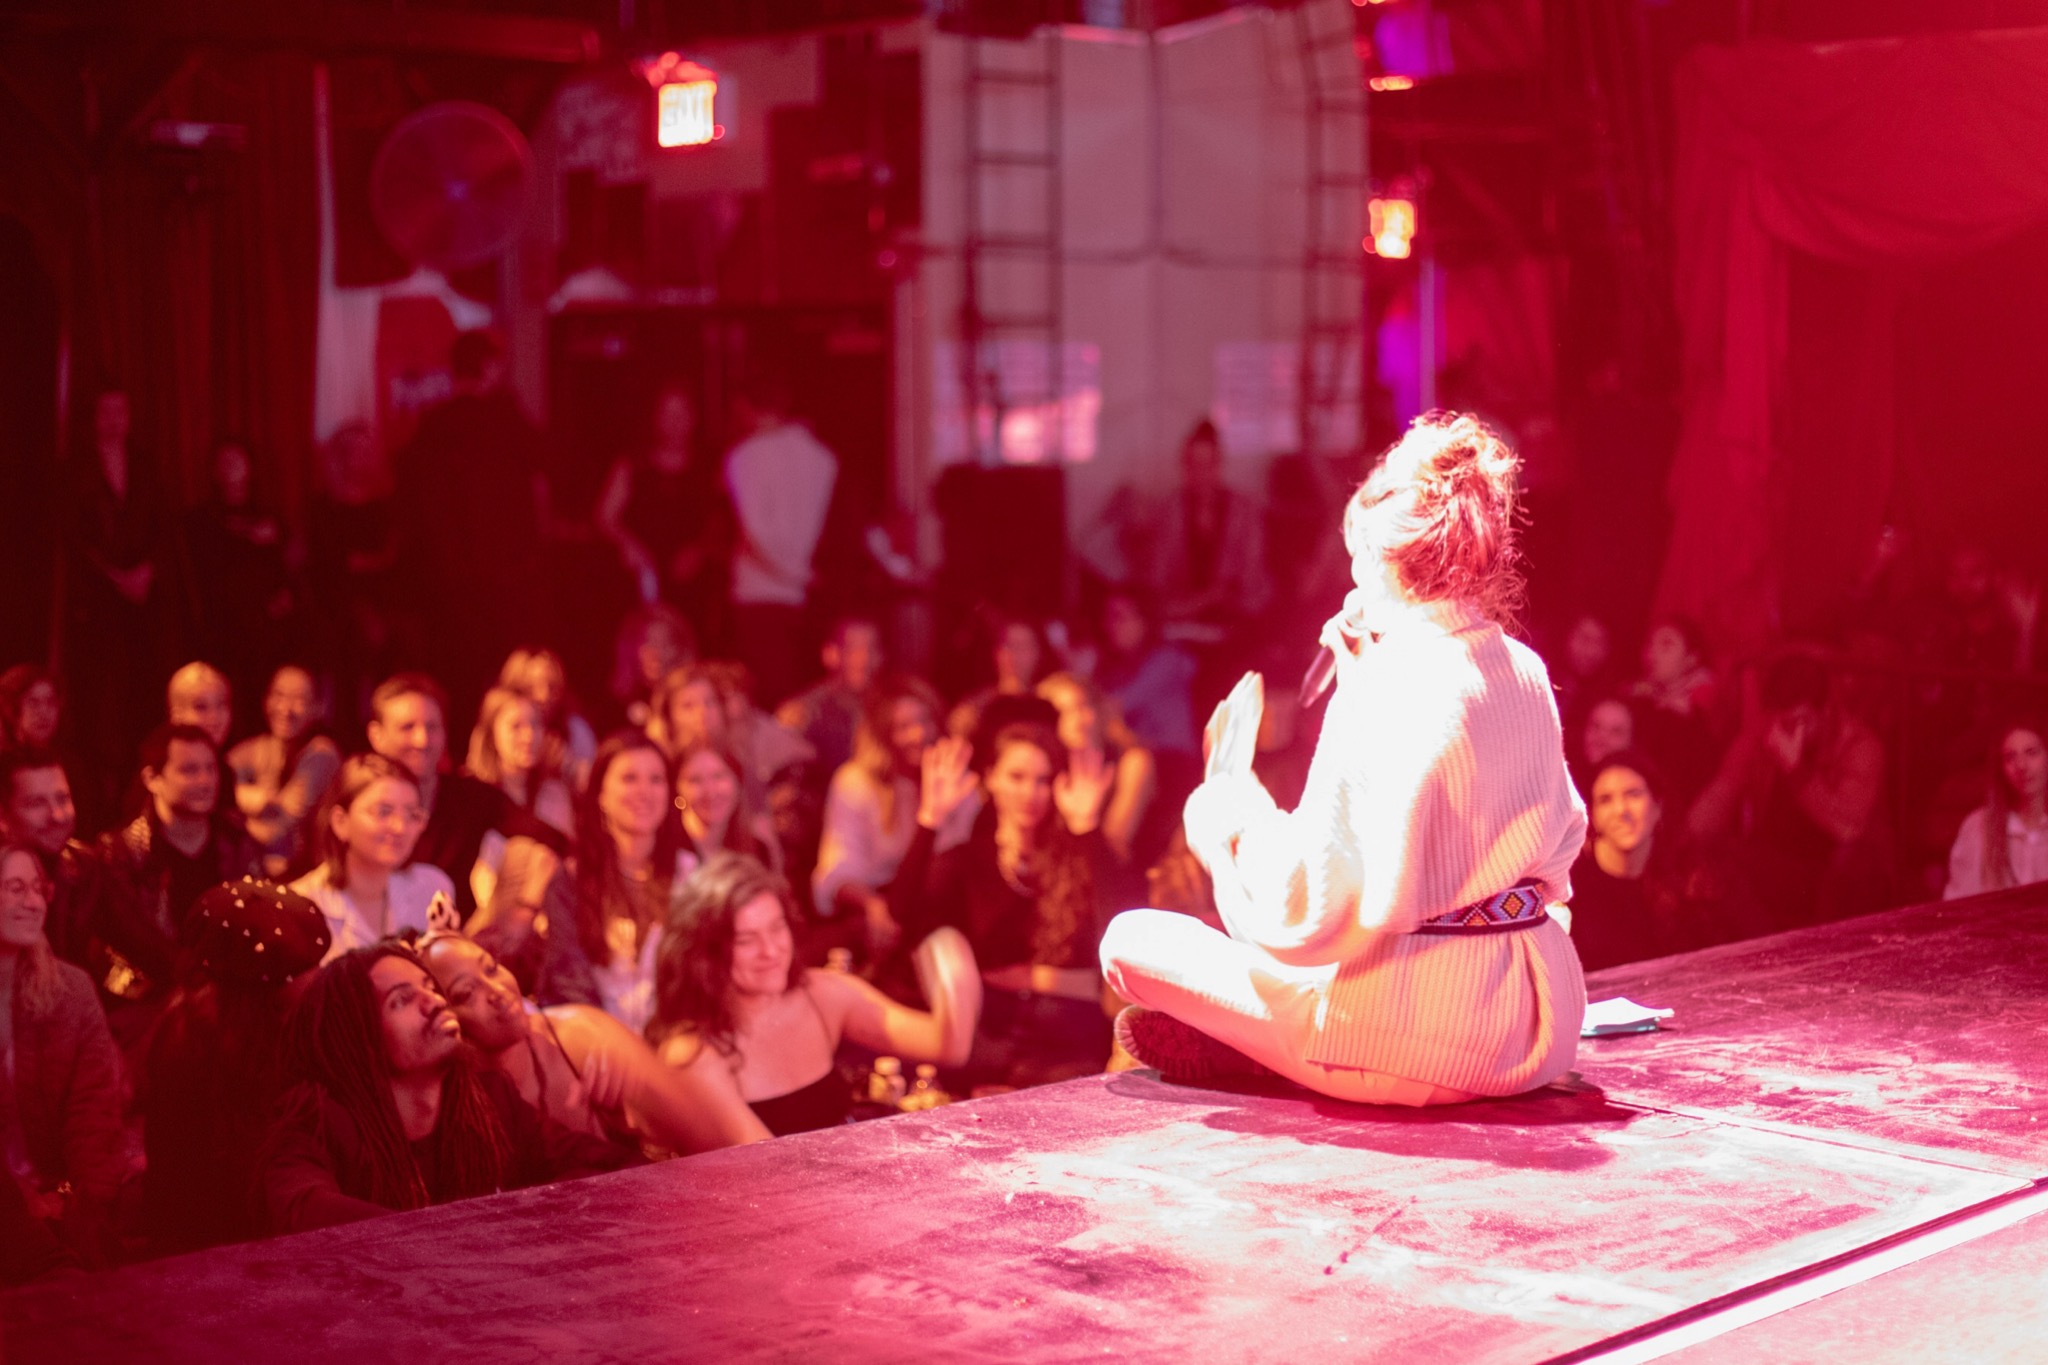 Rhythmic meditation - Breathe, beats and body…